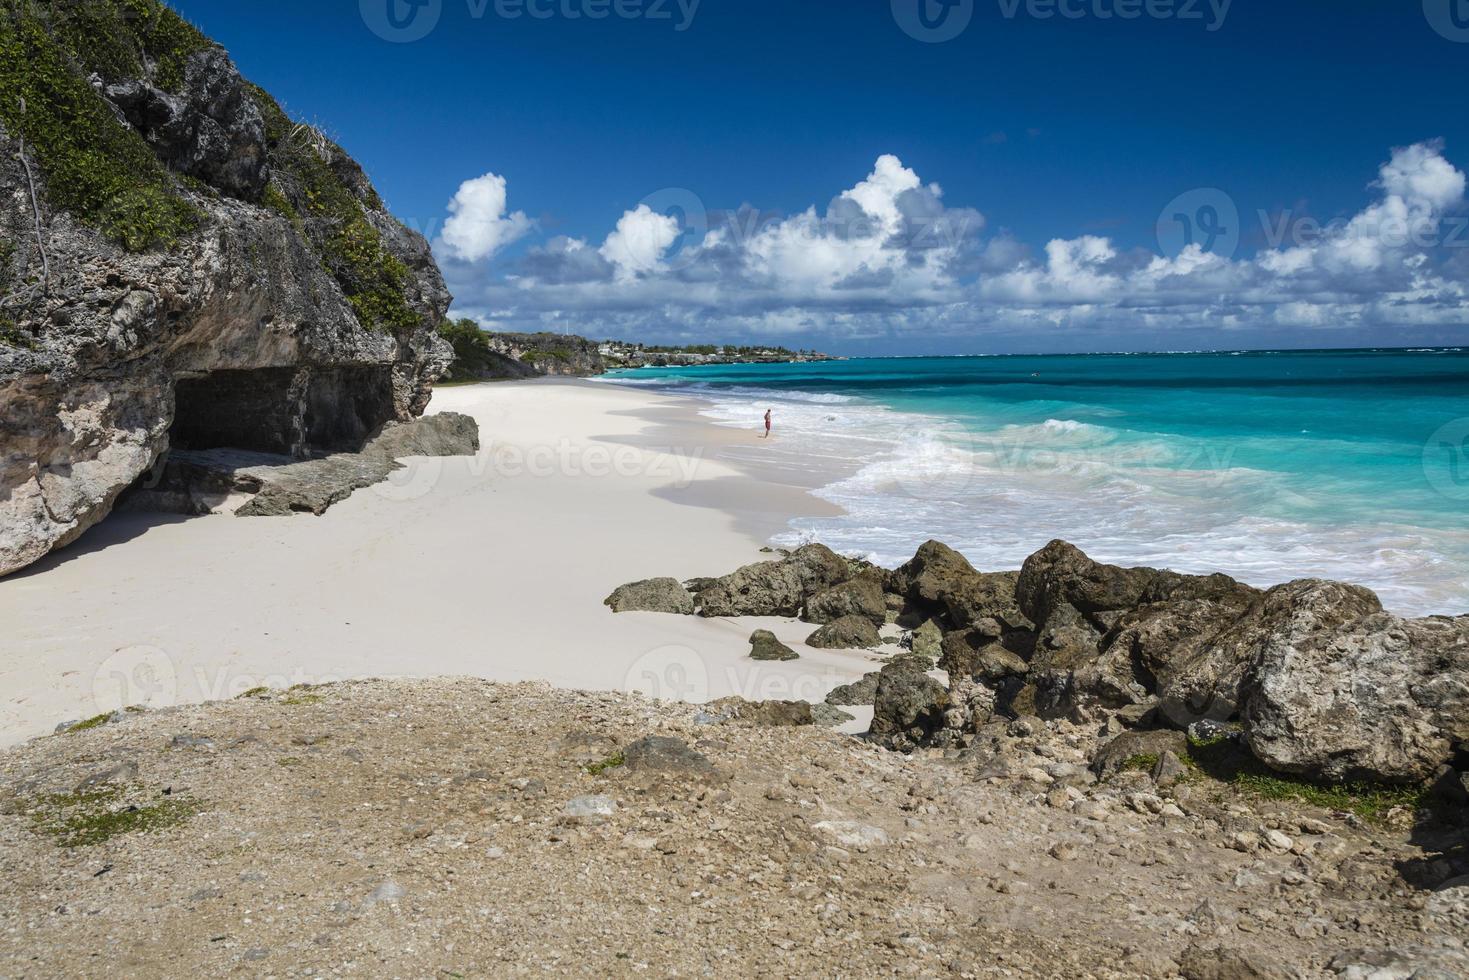 Lone person on beautiful Barbados Beach photo